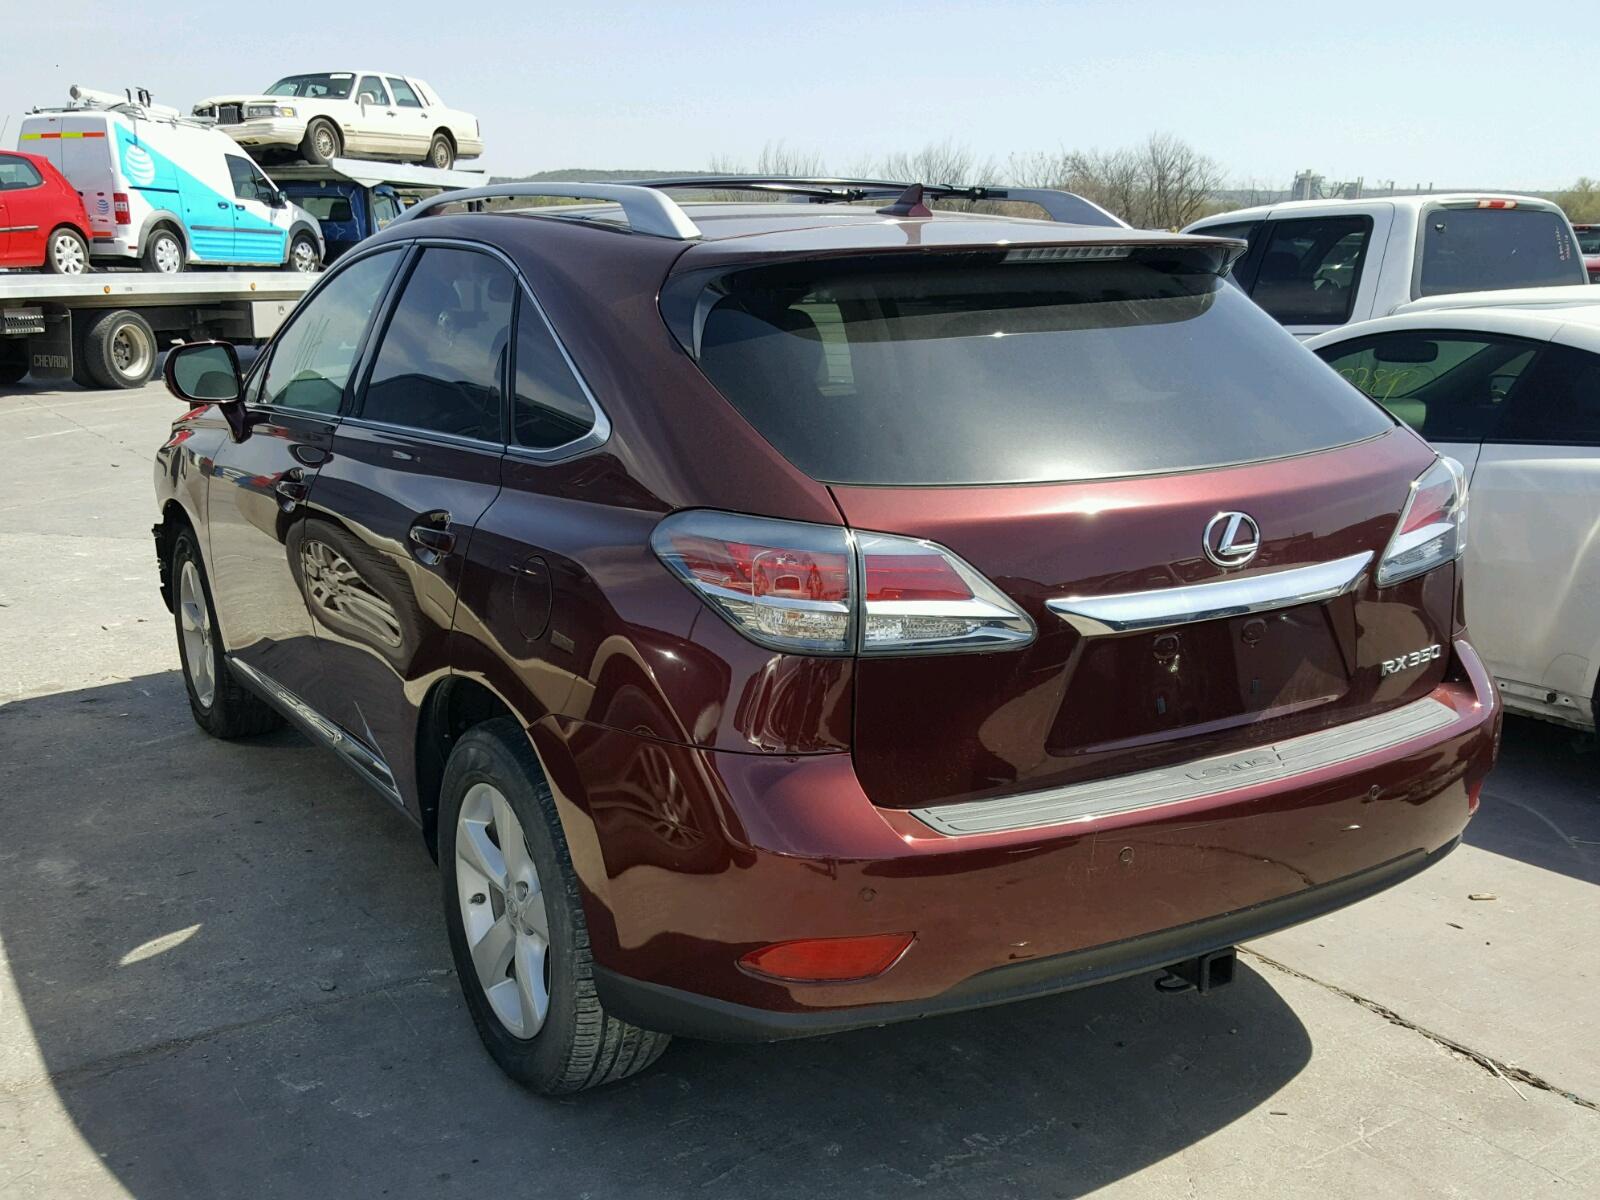 crossover stu hybrid s reviews awd luxury lexus suv cc